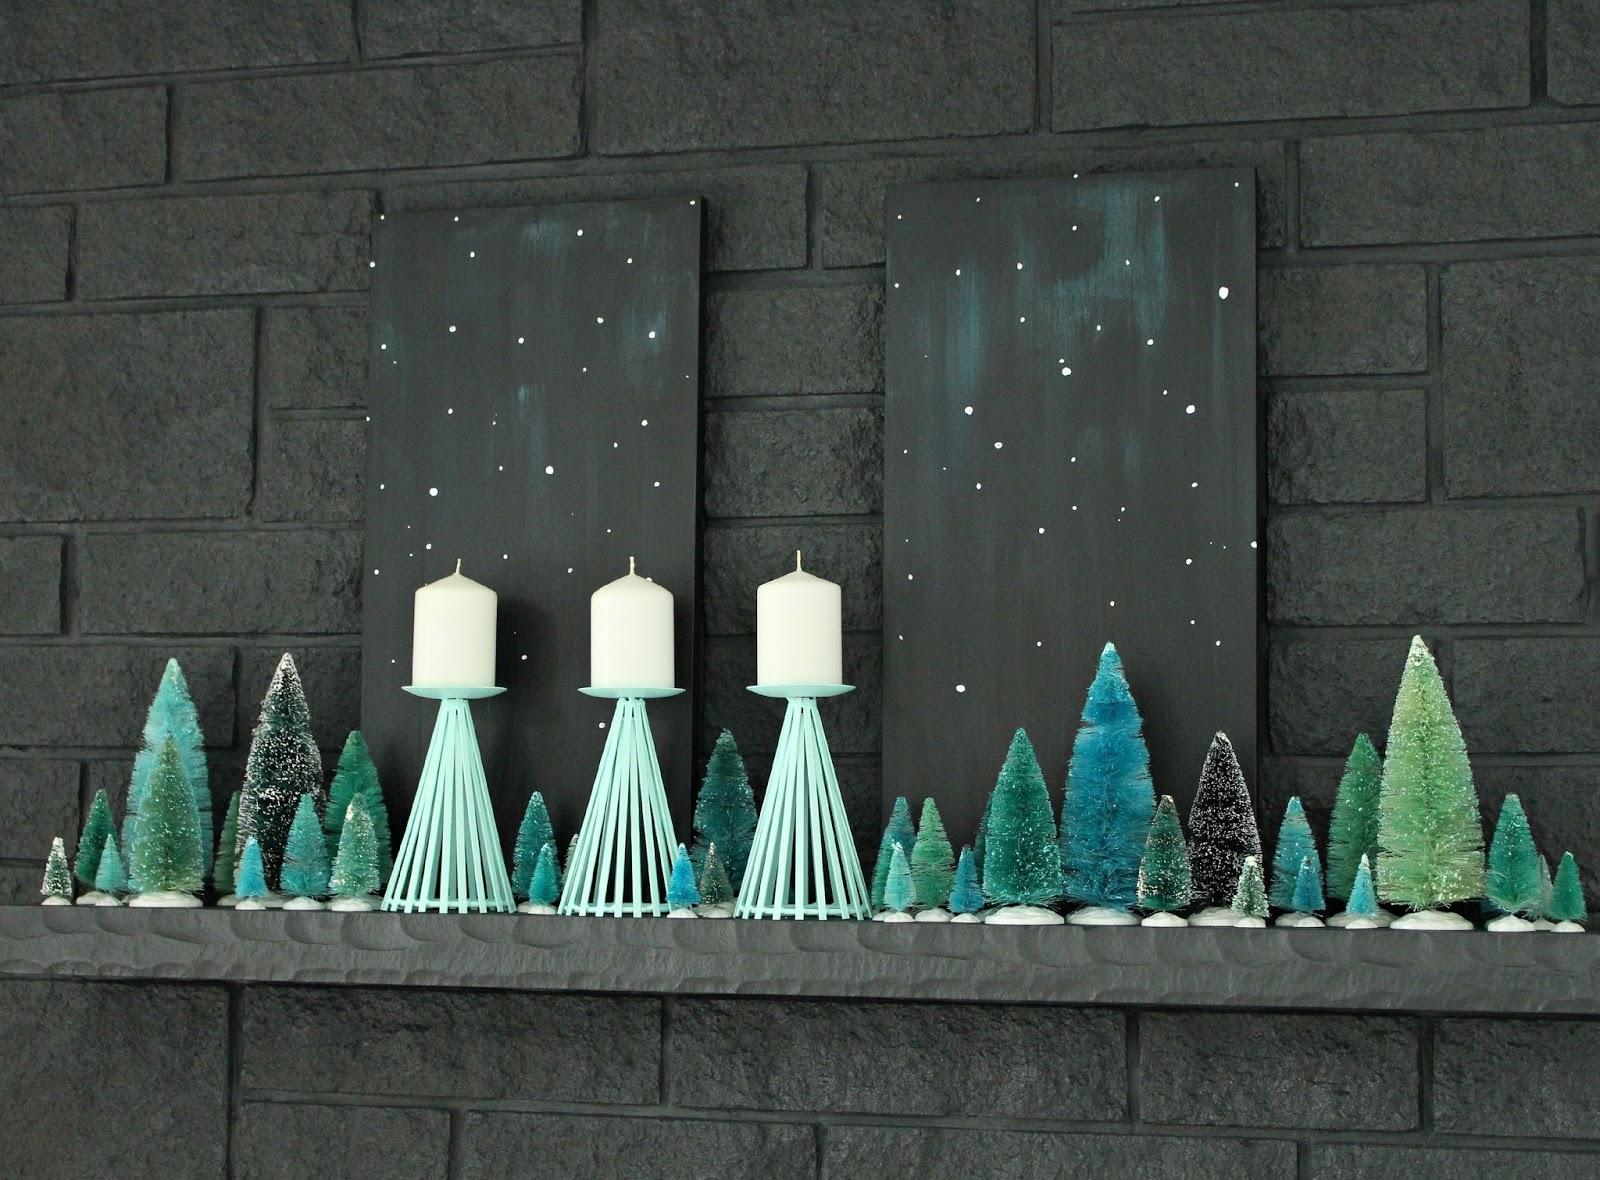 Vintage-inspired holiday mantle decor